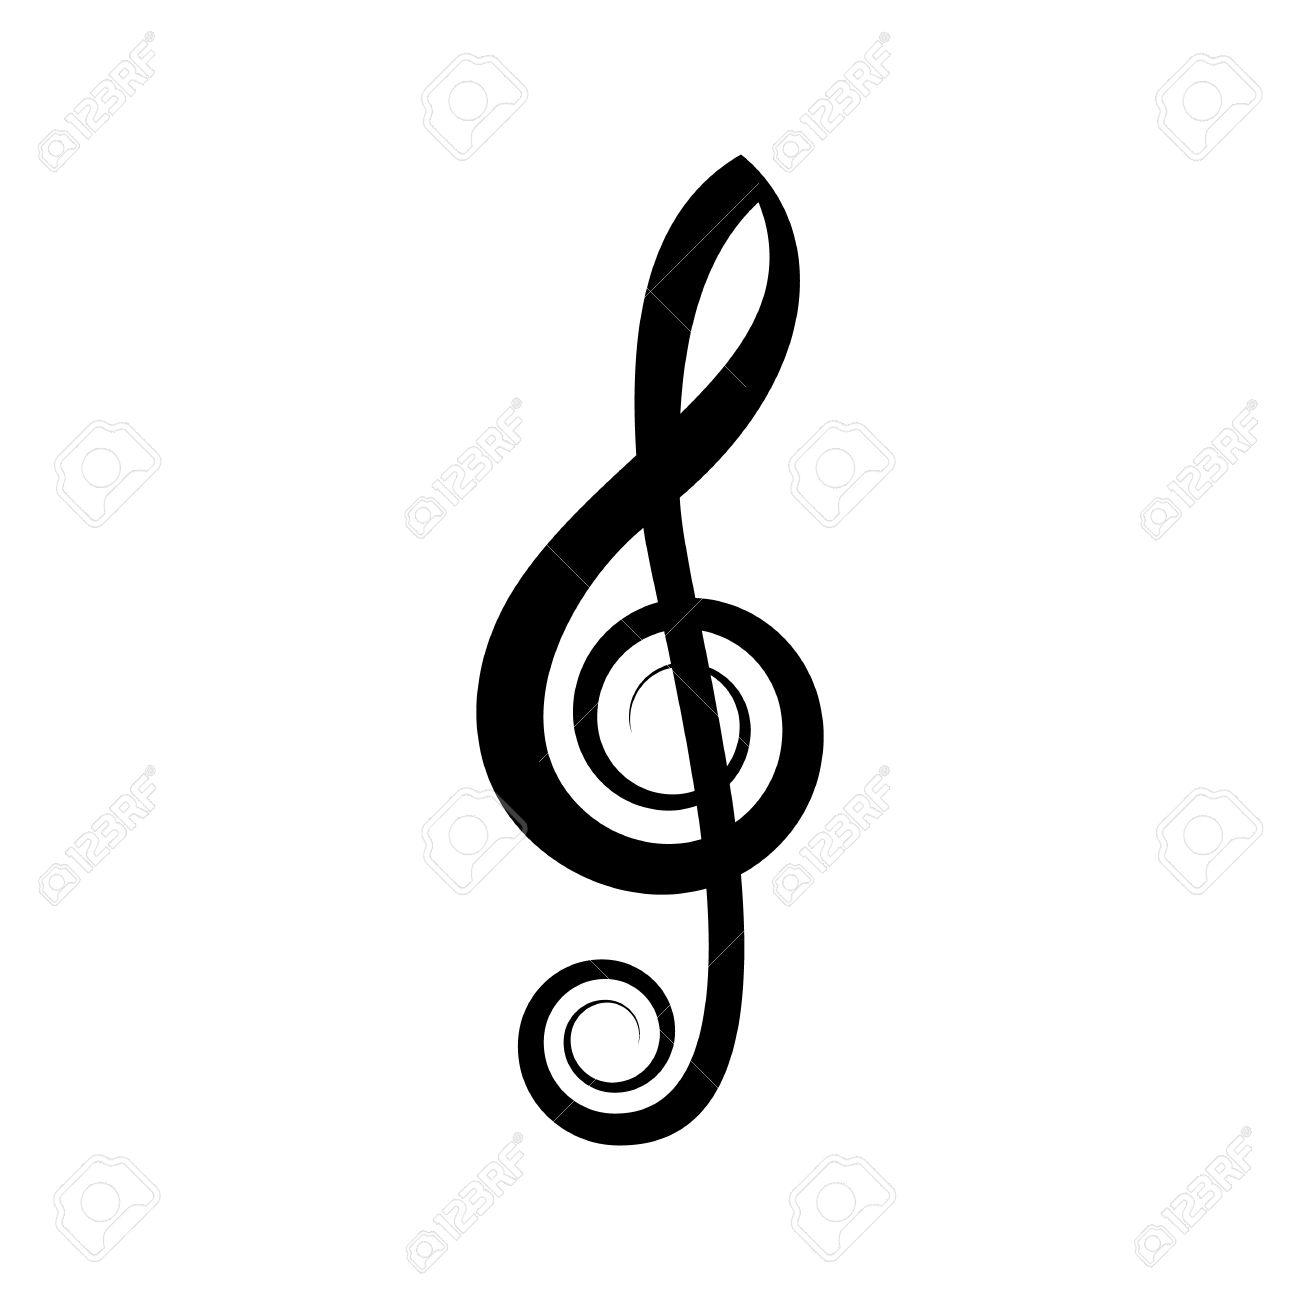 simple black vector treble clef icon on white royalty free cliparts rh 123rf com